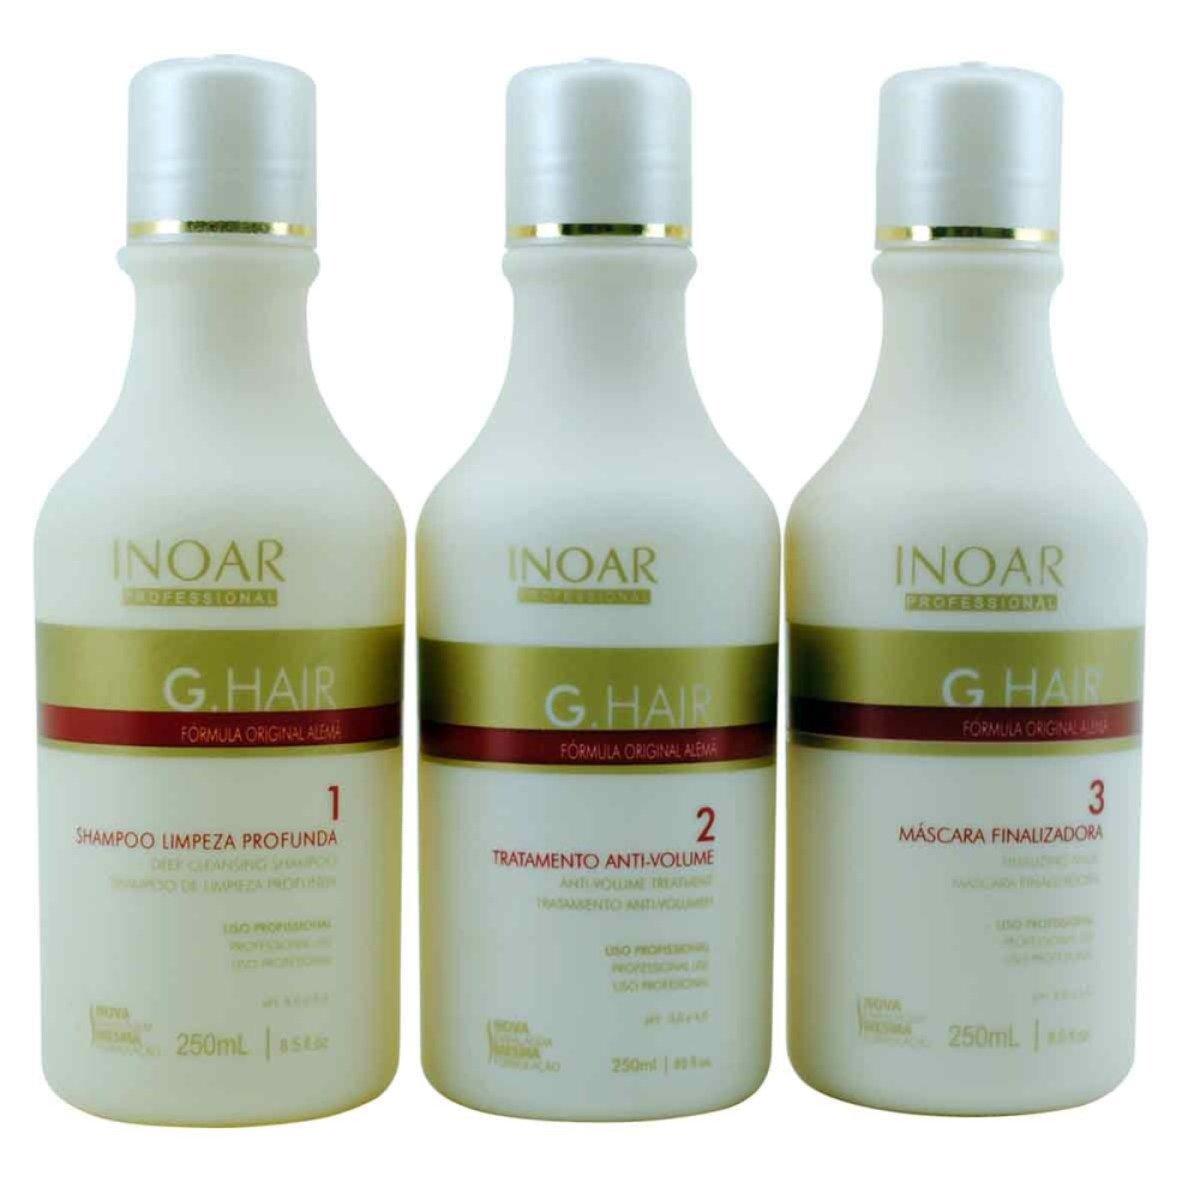 INOAR - Kit Ghair di Cheratina Brasiliana anti crespo 3 X 250ml bottilgie originali Inoar Professional